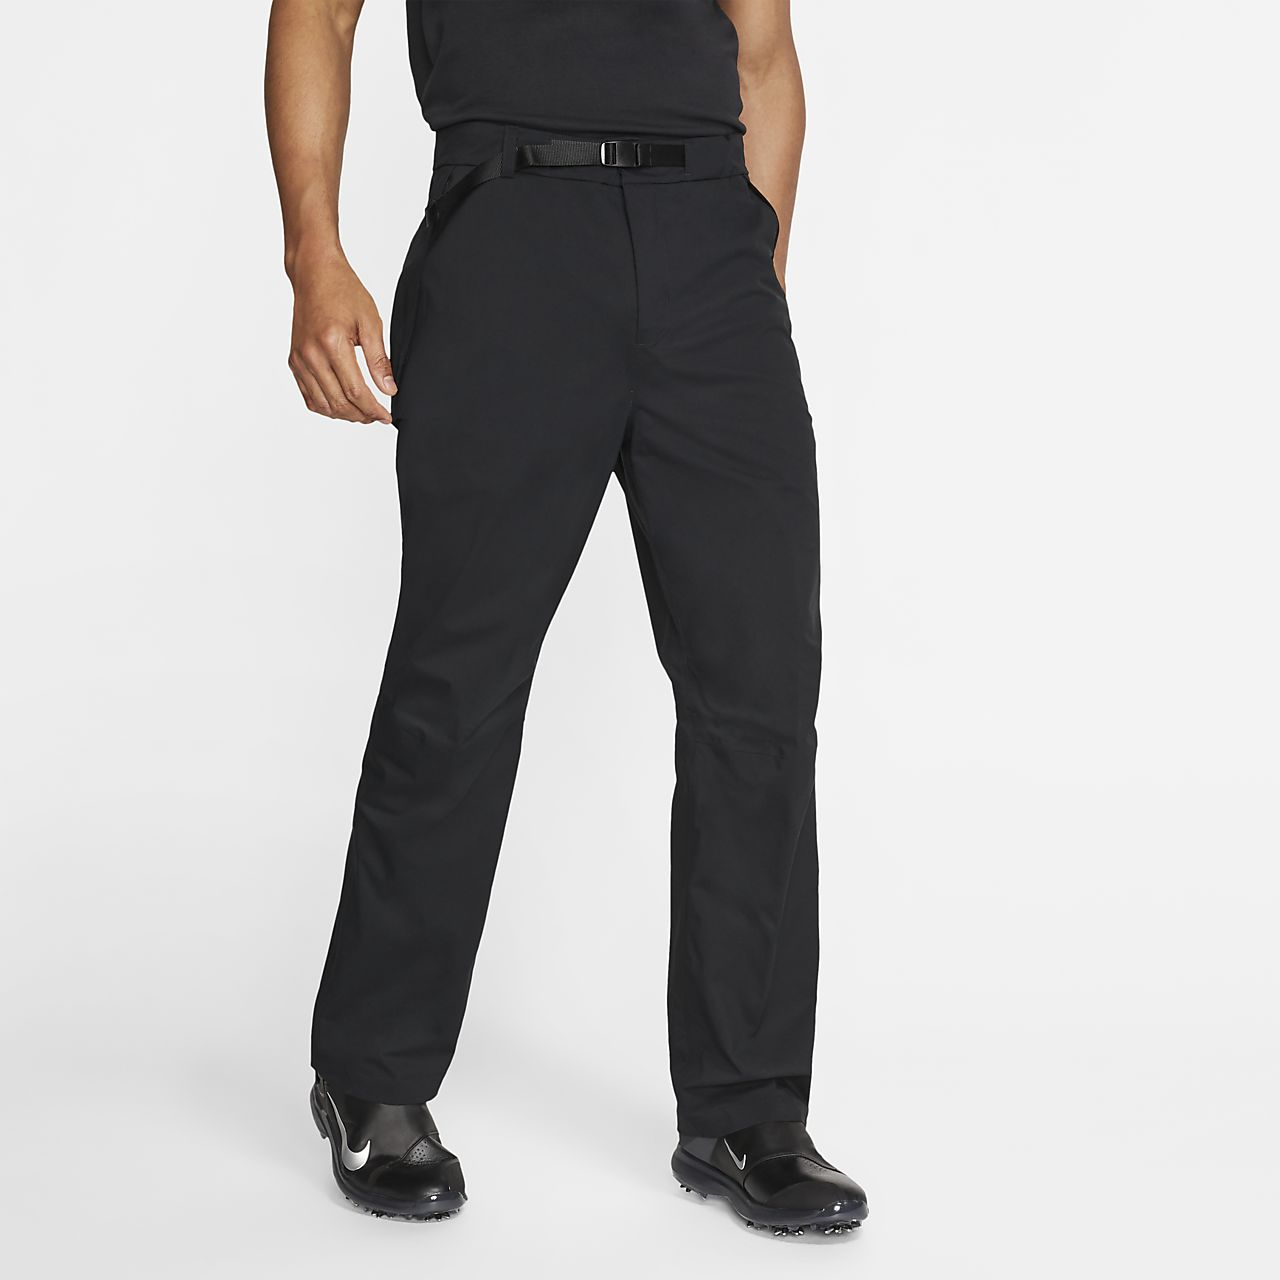 5b4bf9f808 Low Resolution Nike HyperShield Men s Golf Trousers Nike HyperShield Men s  Golf Trousers